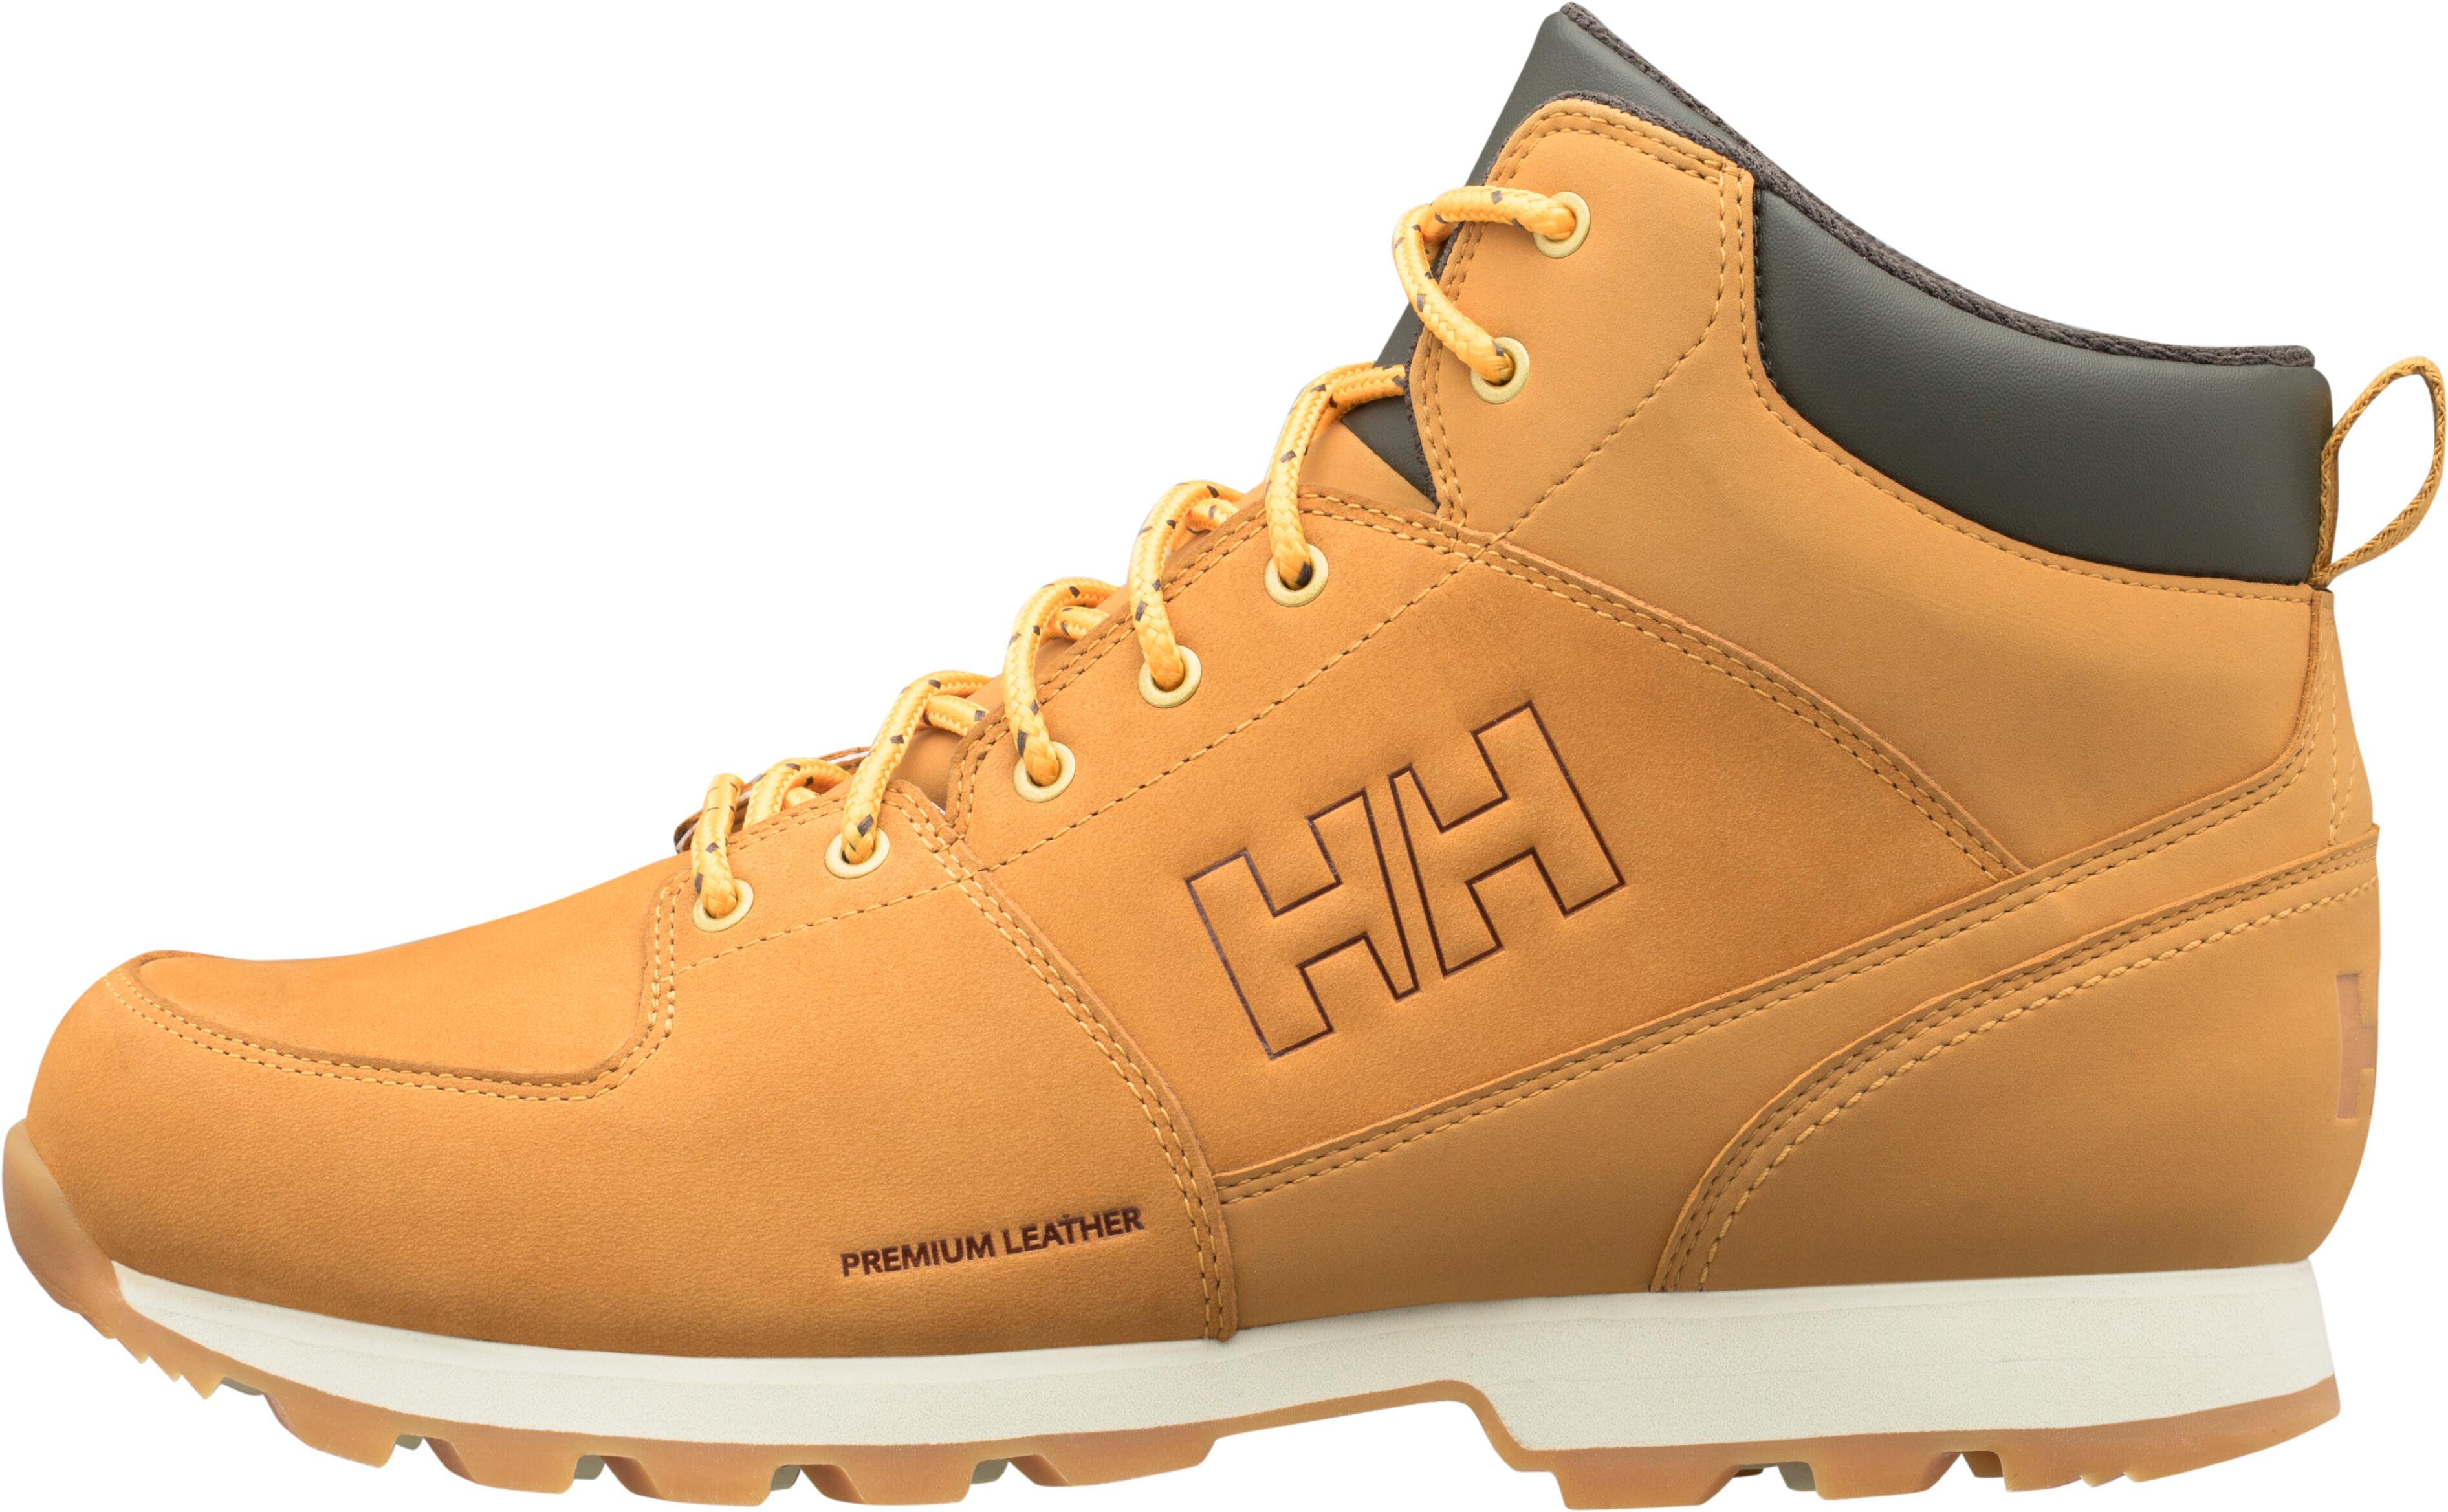 85a393c3 Helly Hansen Tsuga Shoes Herrer, new wheat/espresso/natura/metallic silver